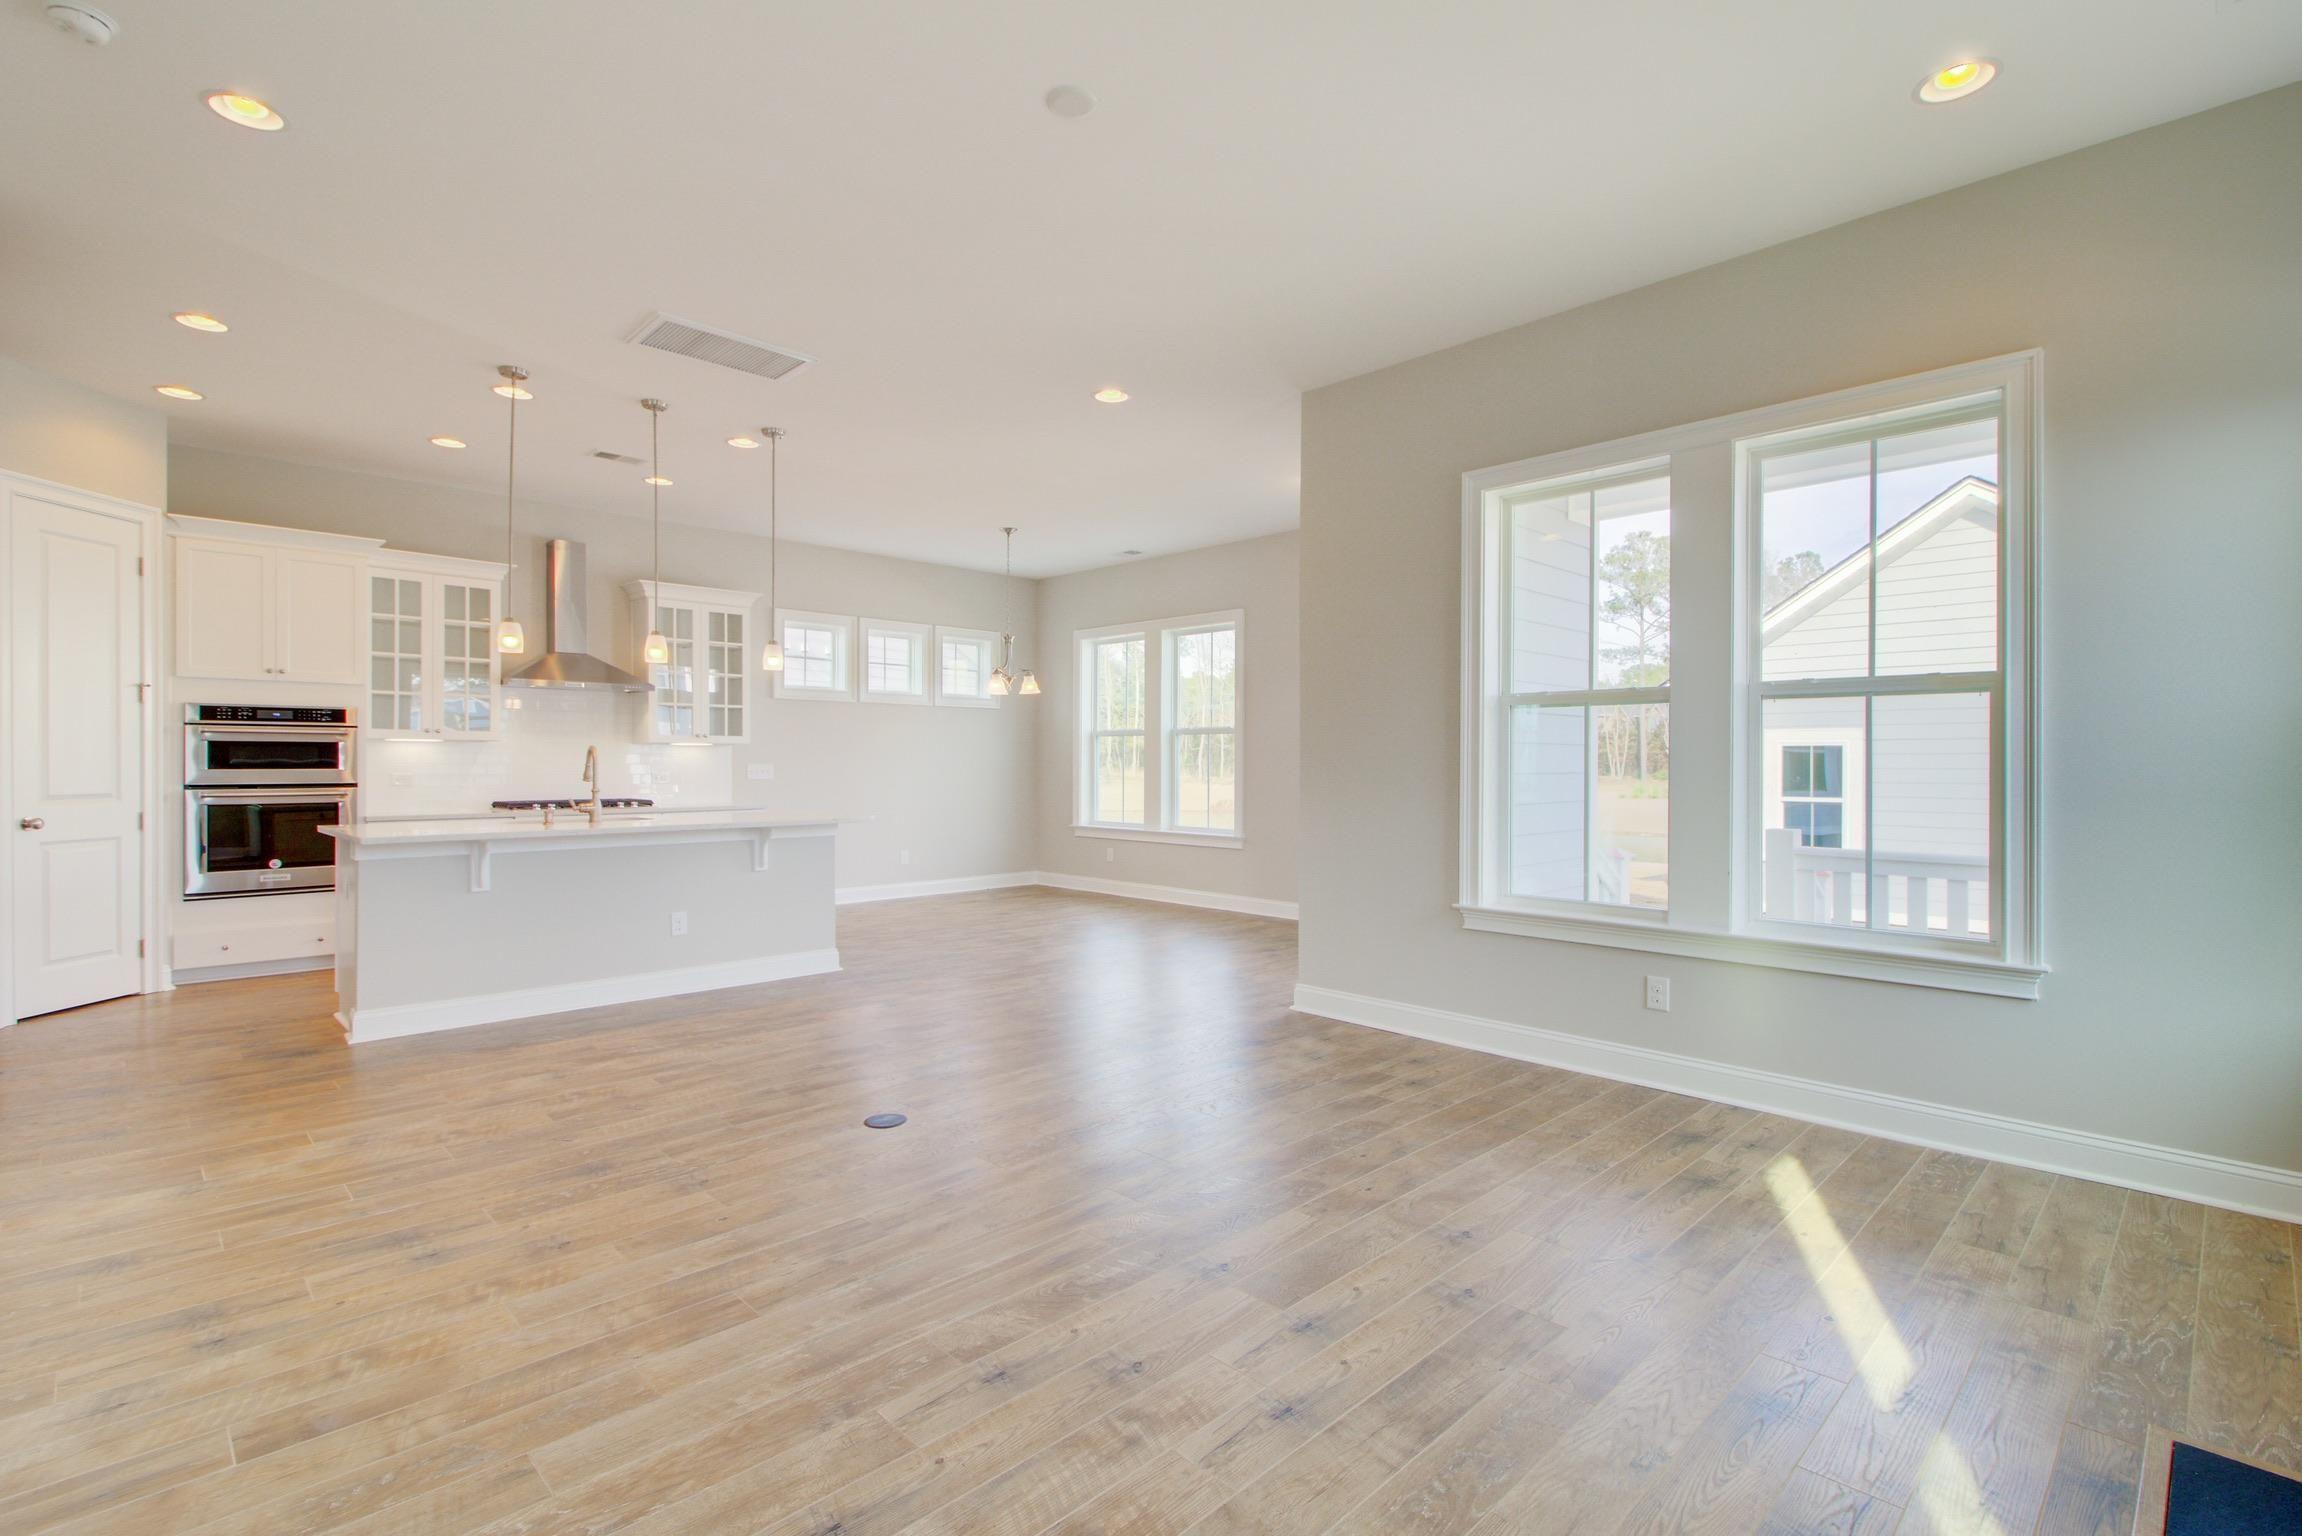 Carolina Park Homes For Sale - 1762 Sandybrook, Mount Pleasant, SC - 16